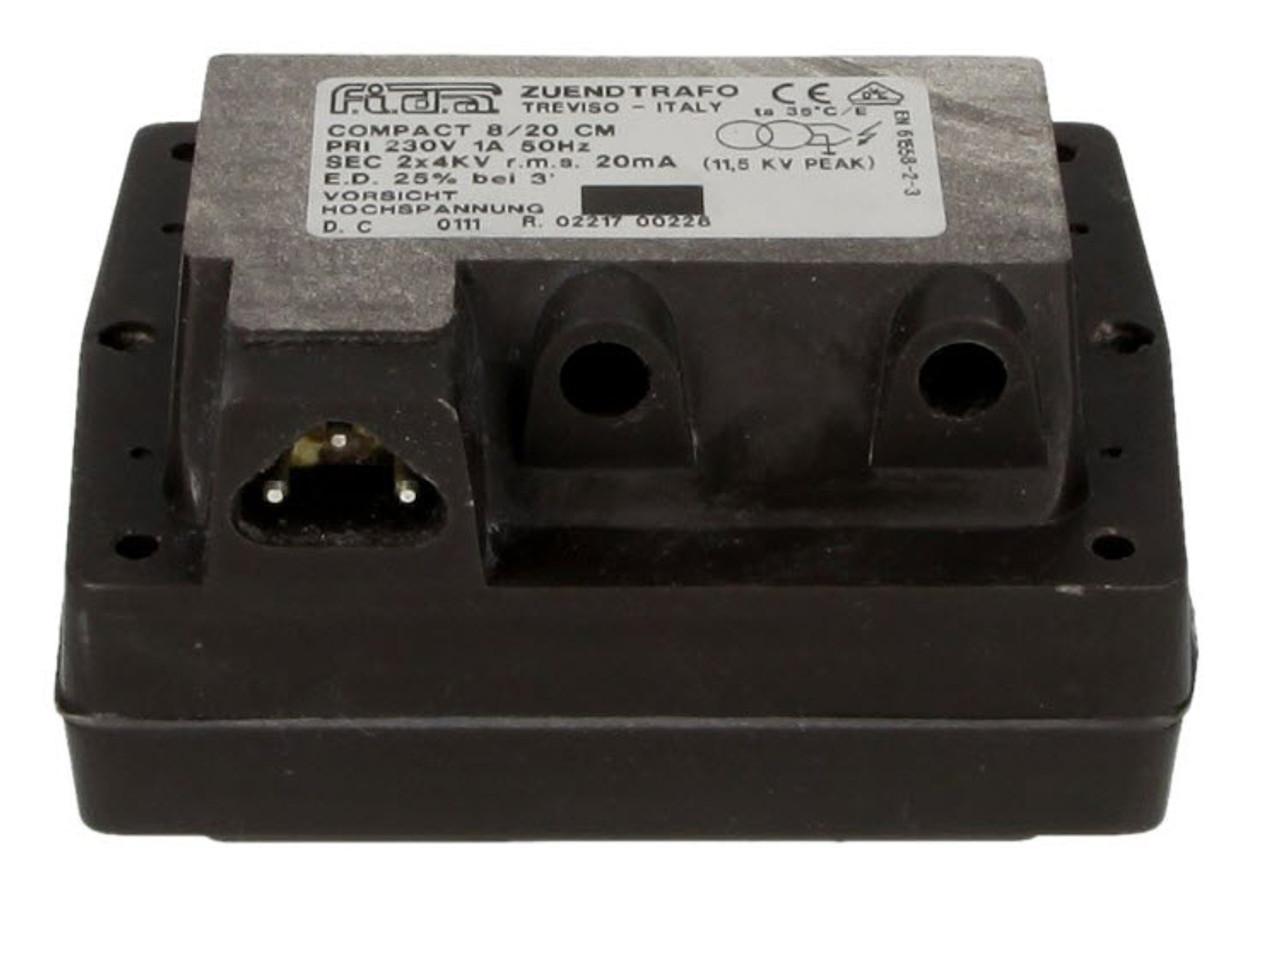 8/20 CM, FIDA ignition transformer